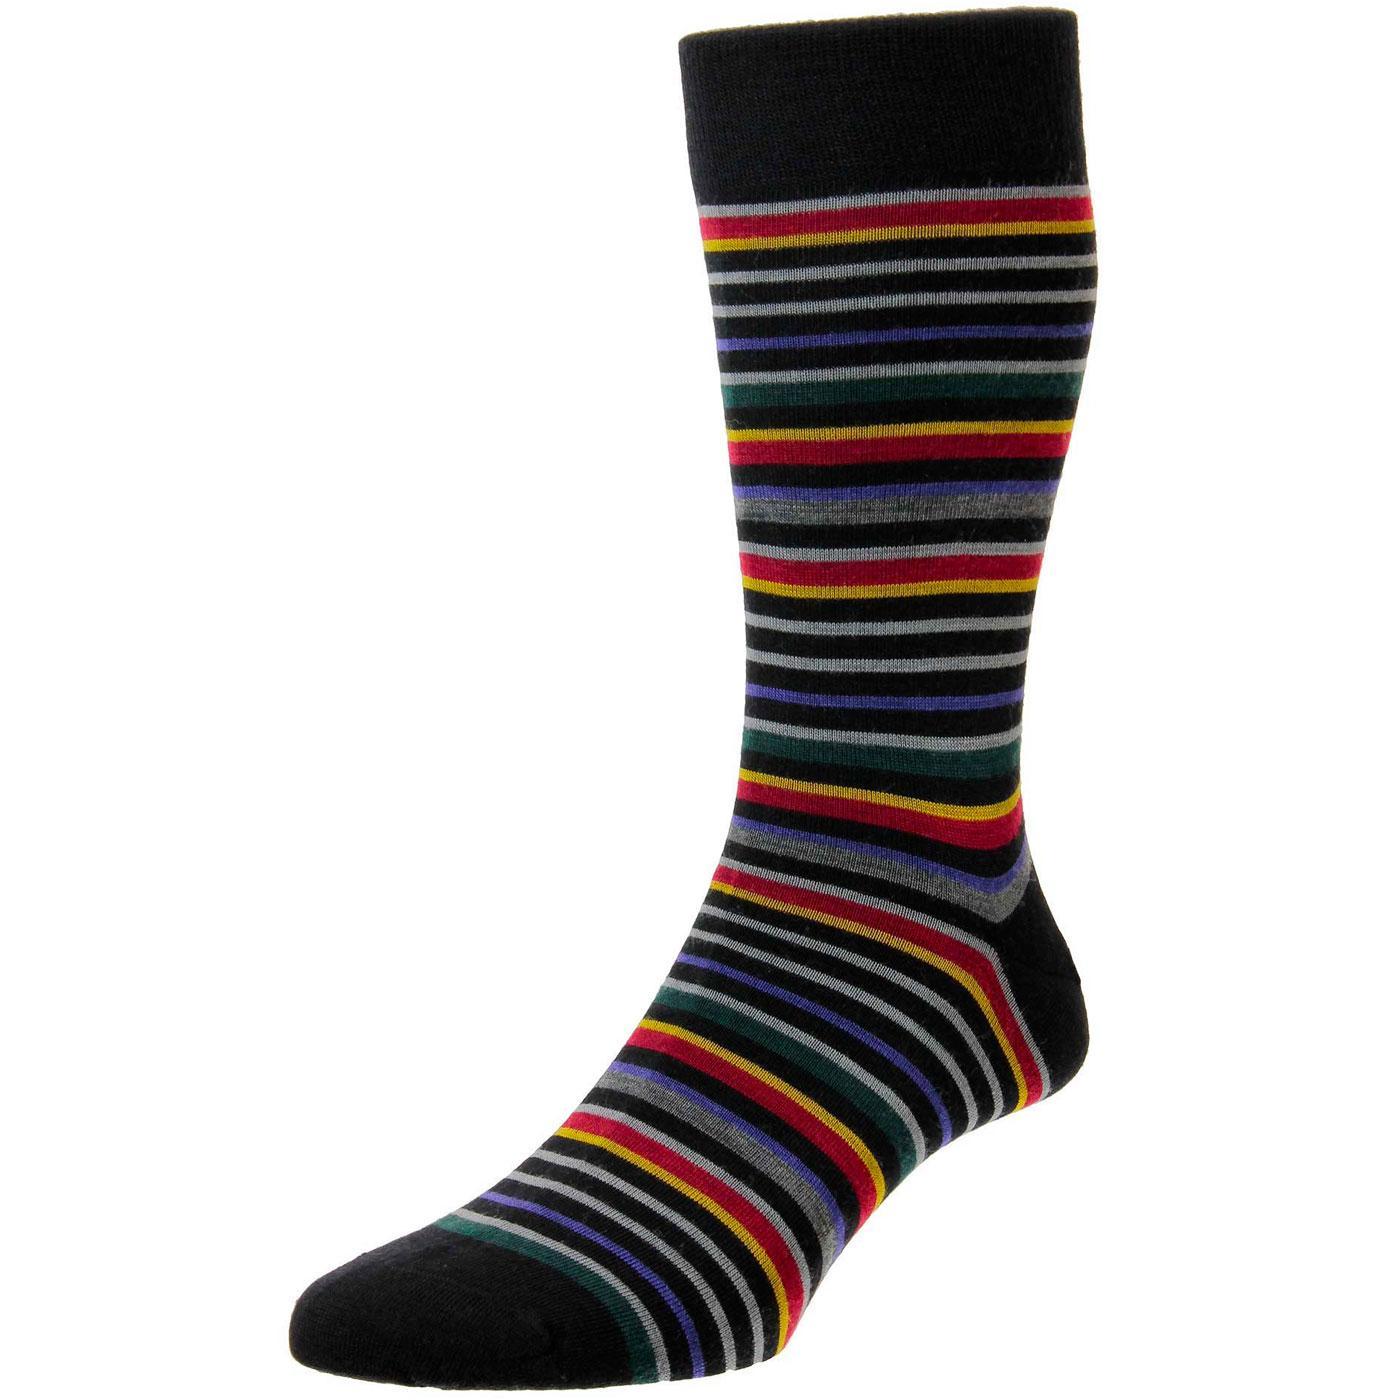 + Sutnar PANTHERELLA Retro Mod Stripe Socks BLACK